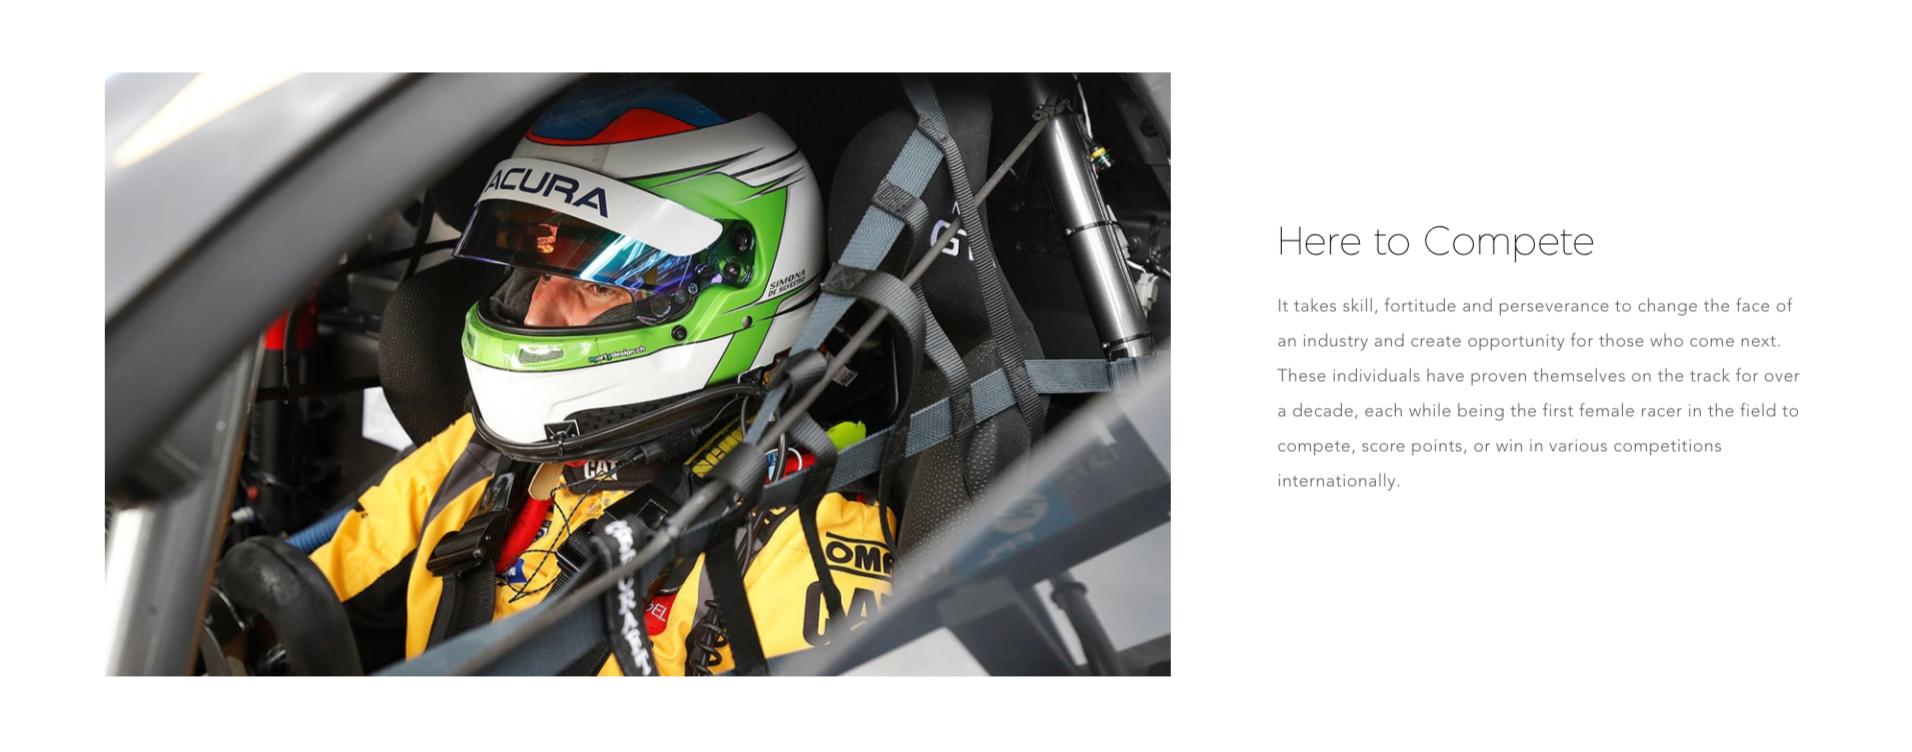 Acura Motorsport _ Female Race Car Drivers _ Acura com (1).png